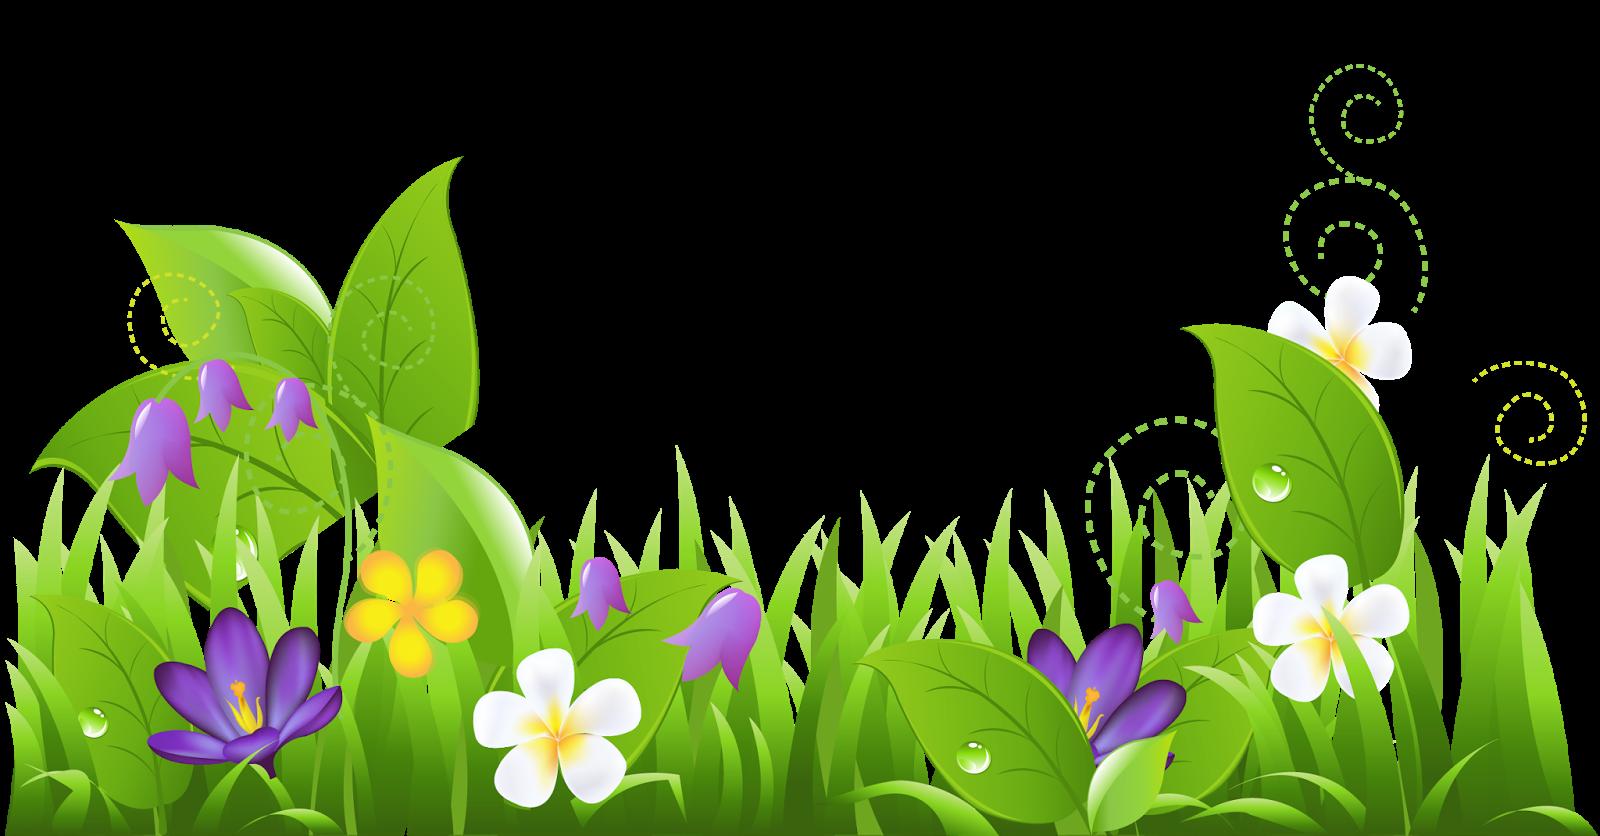 Grass clipart png format, Grass png format Transparent FREE.